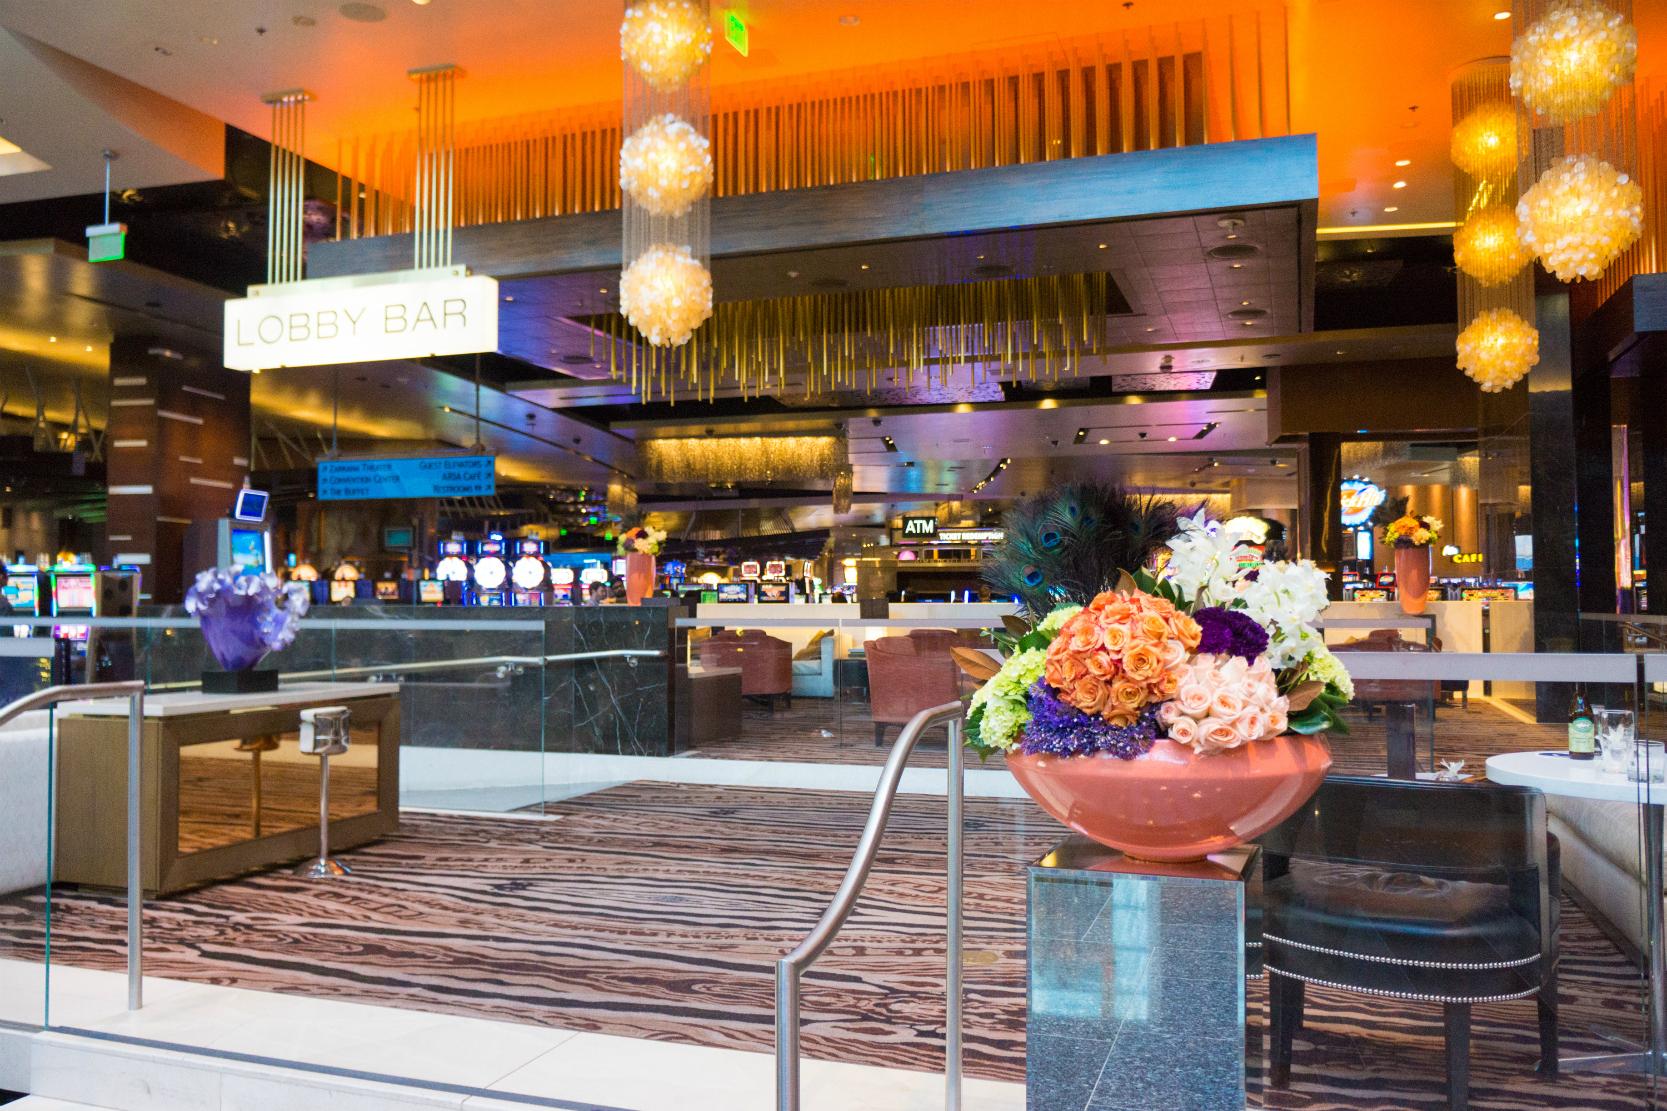 Las Vegas Aria Lobby Bar